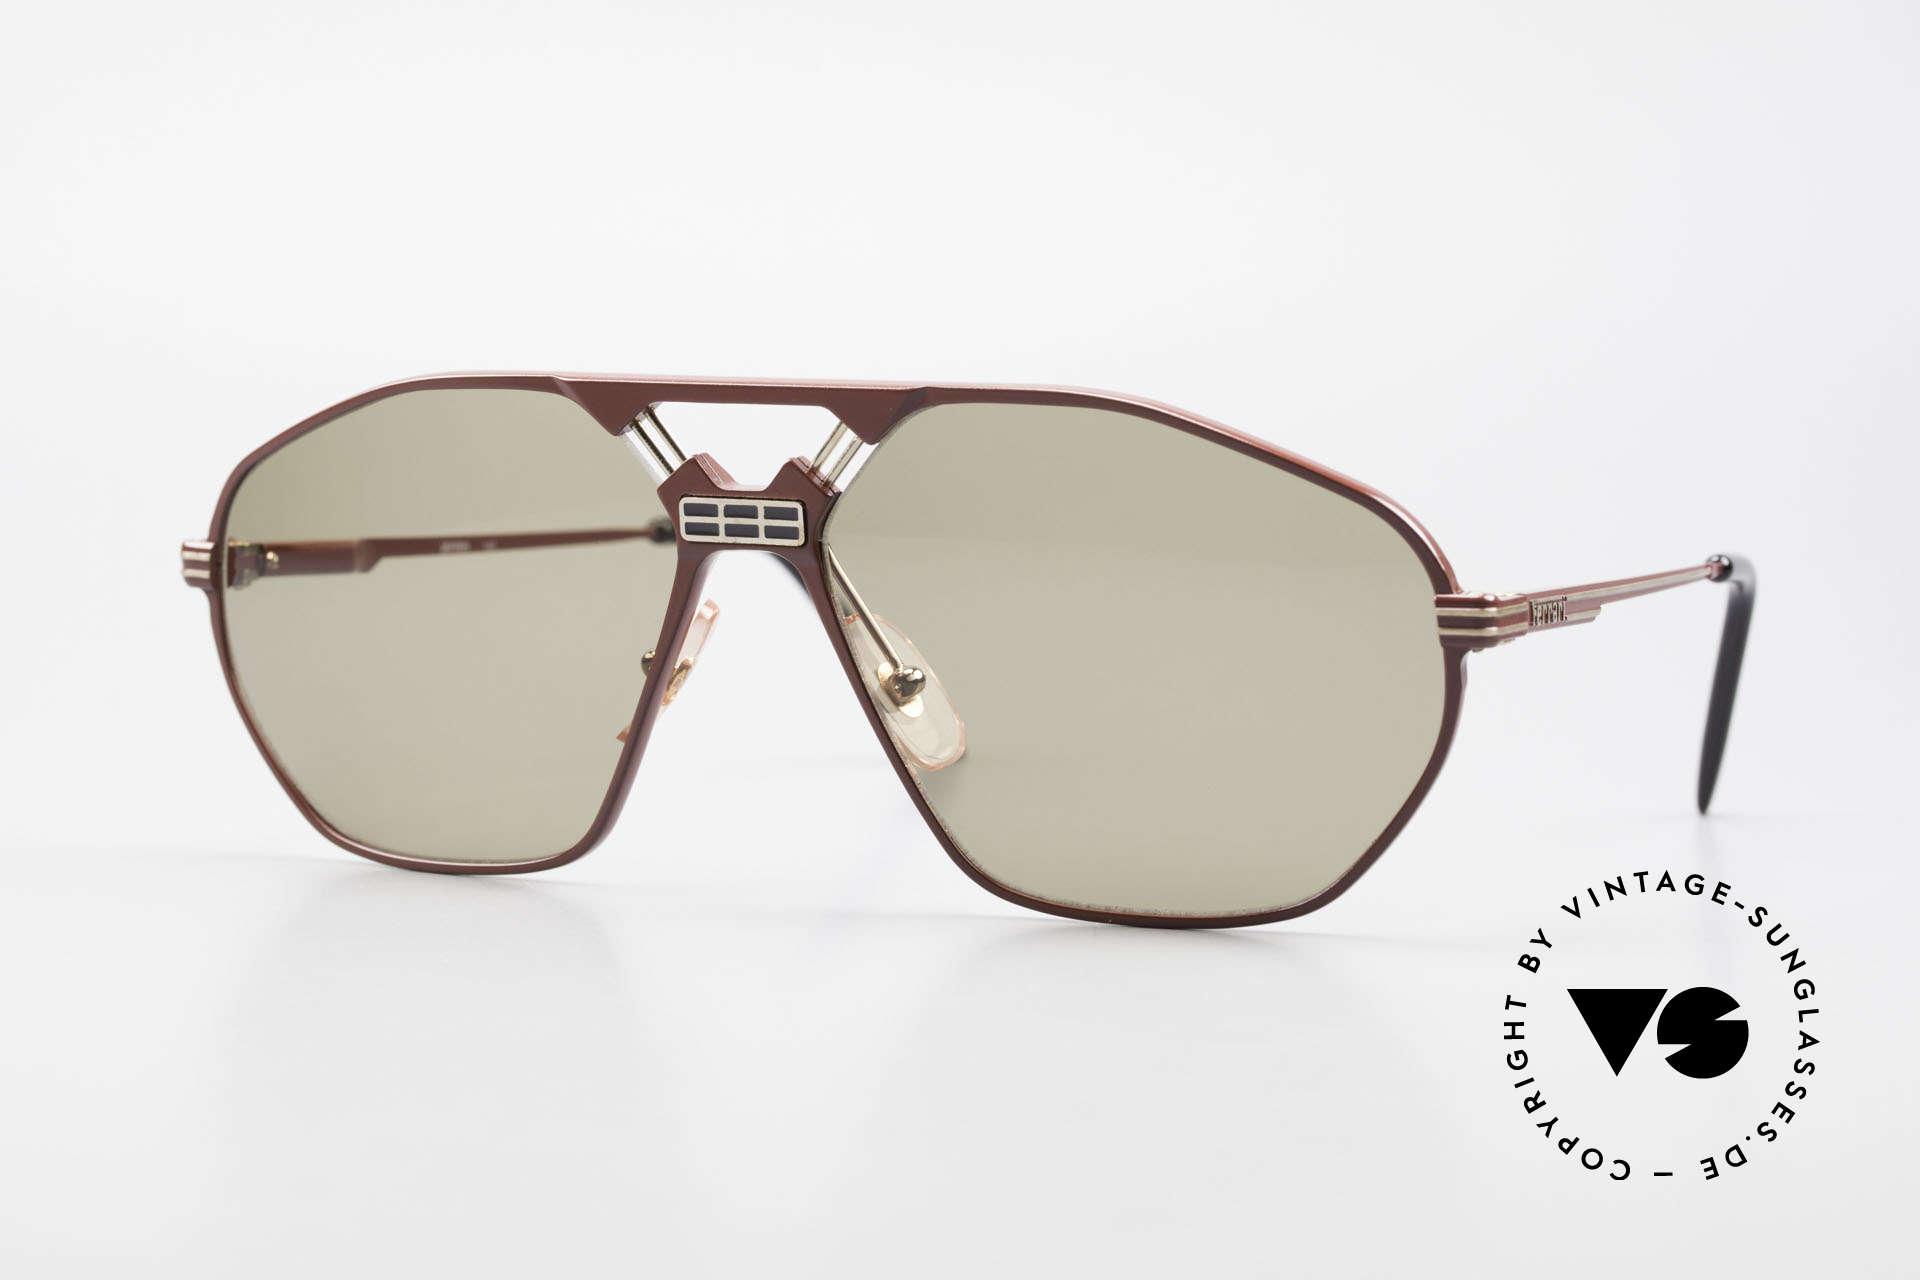 Sunglasses Ferrari F22 S Rare Vintage 90 S Shades Xl